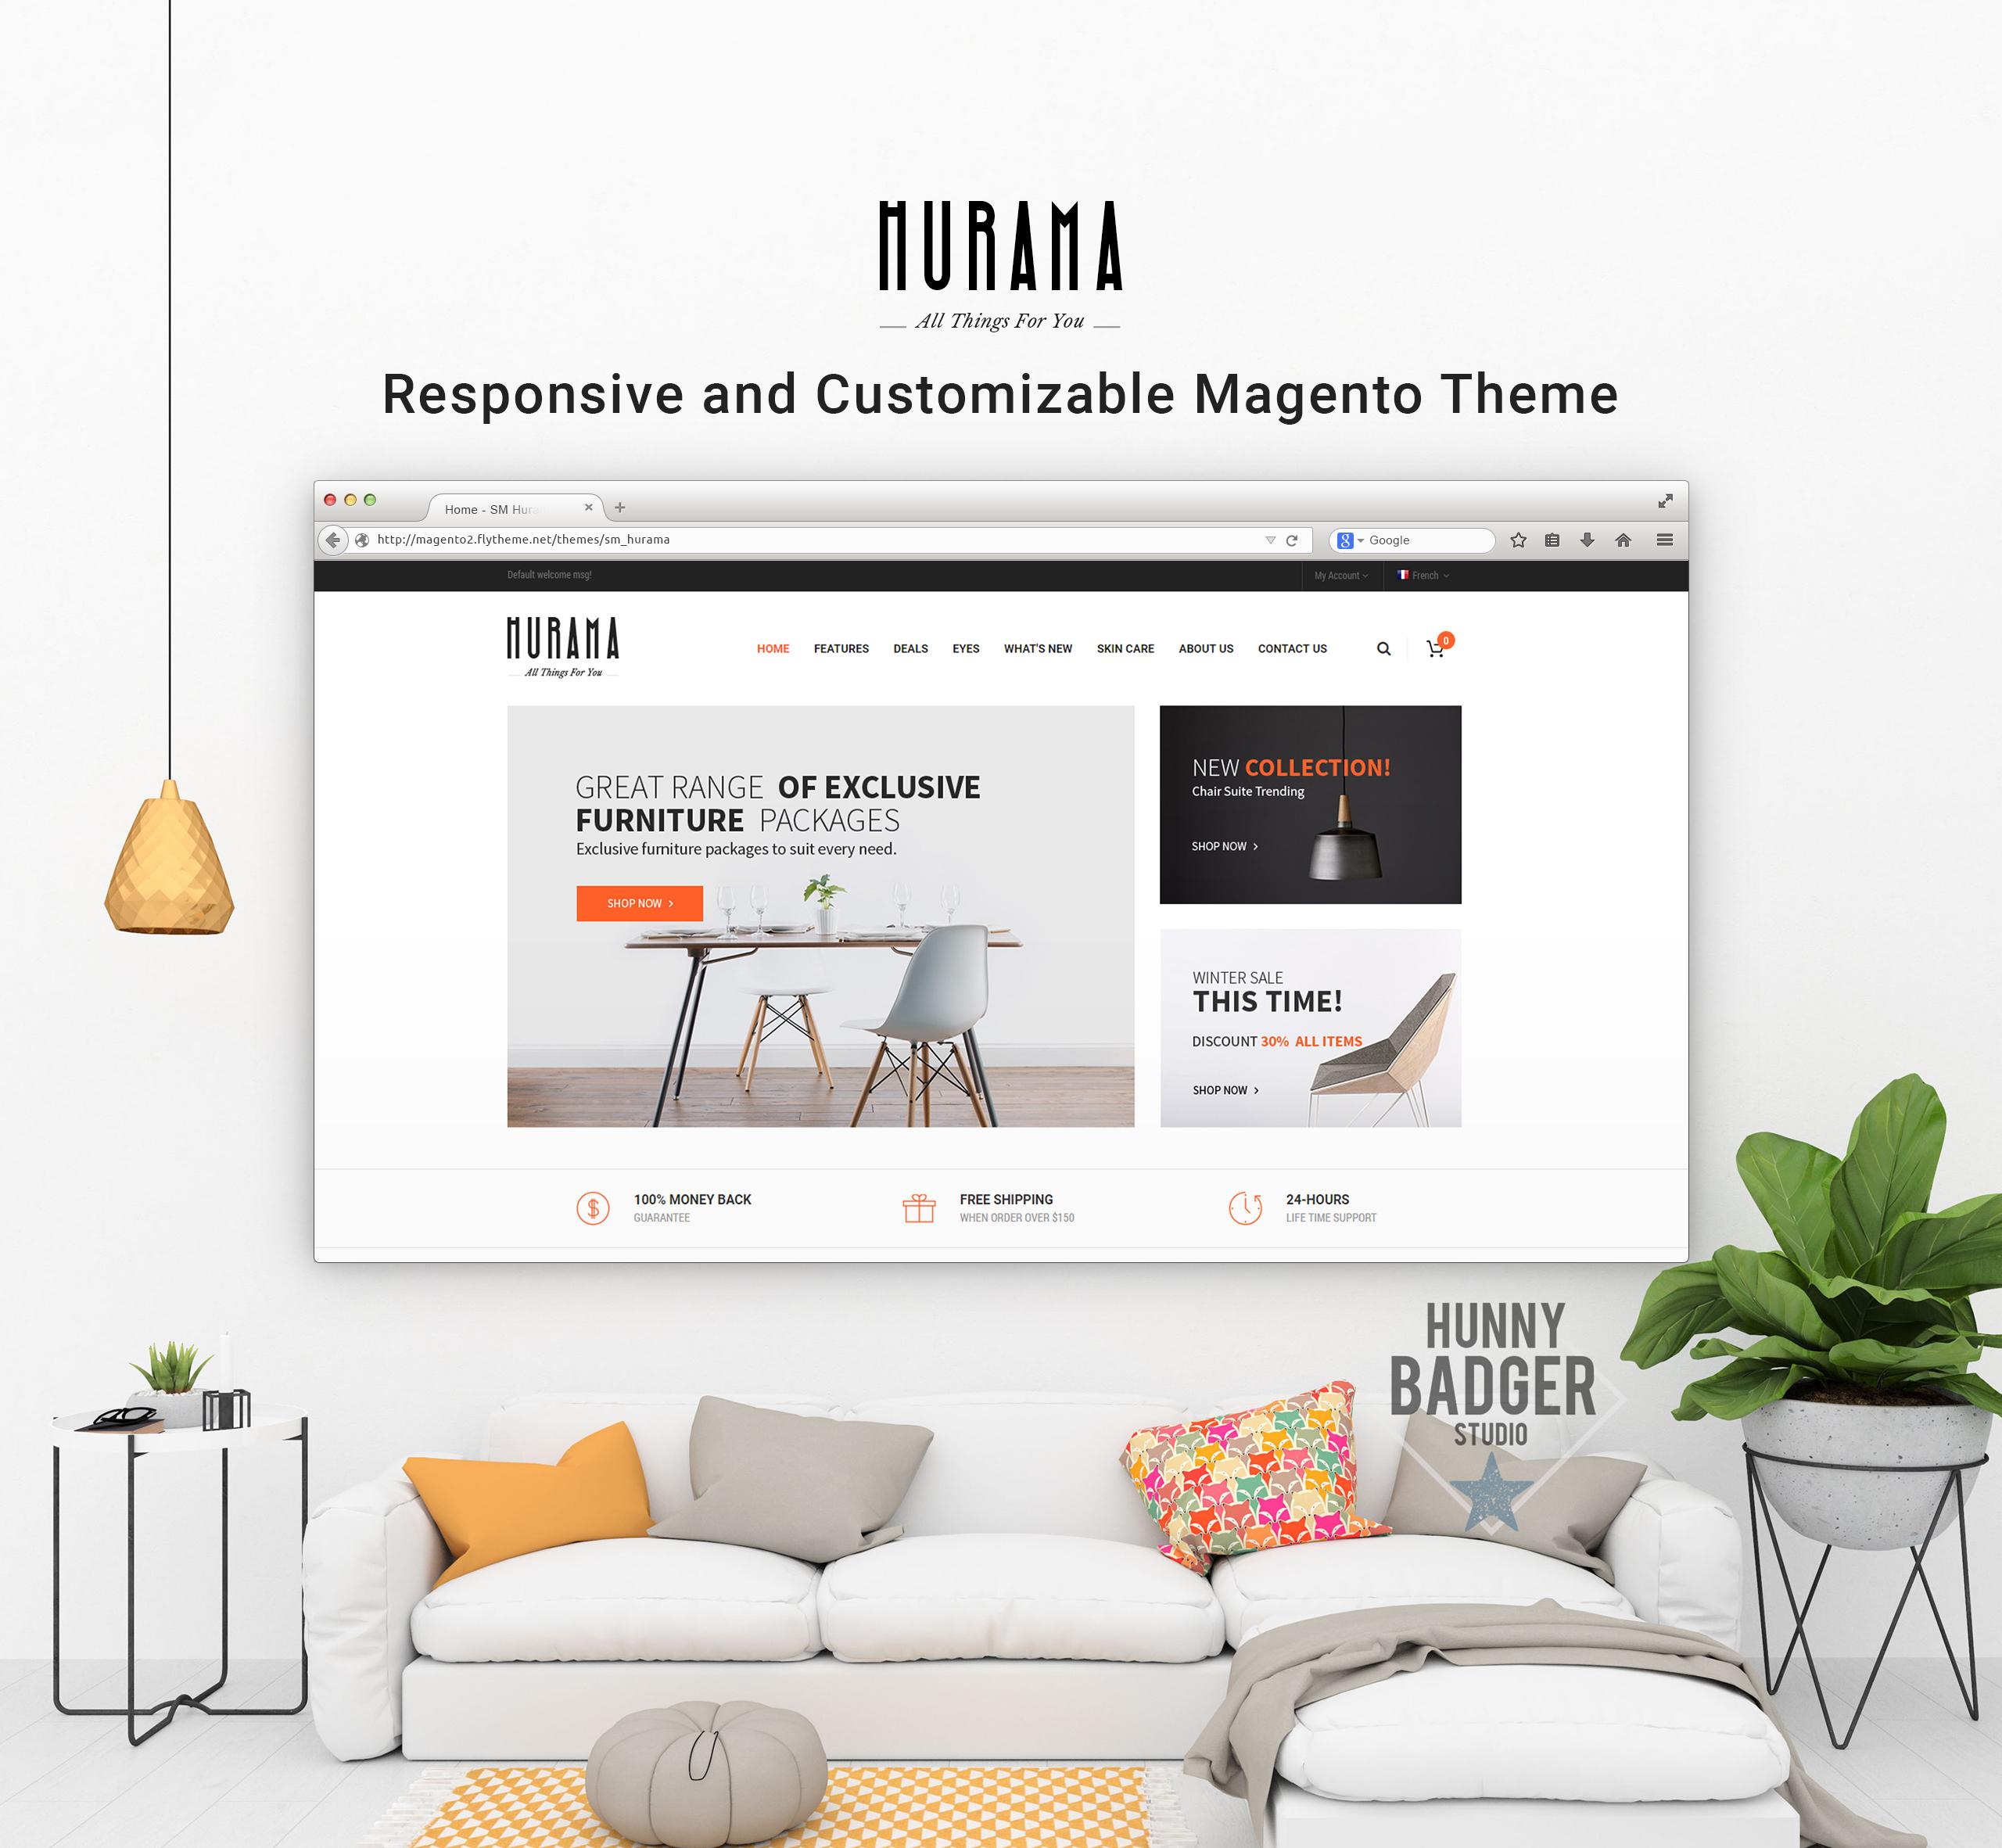 Hurama - Responsive and Customizable Magento Theme